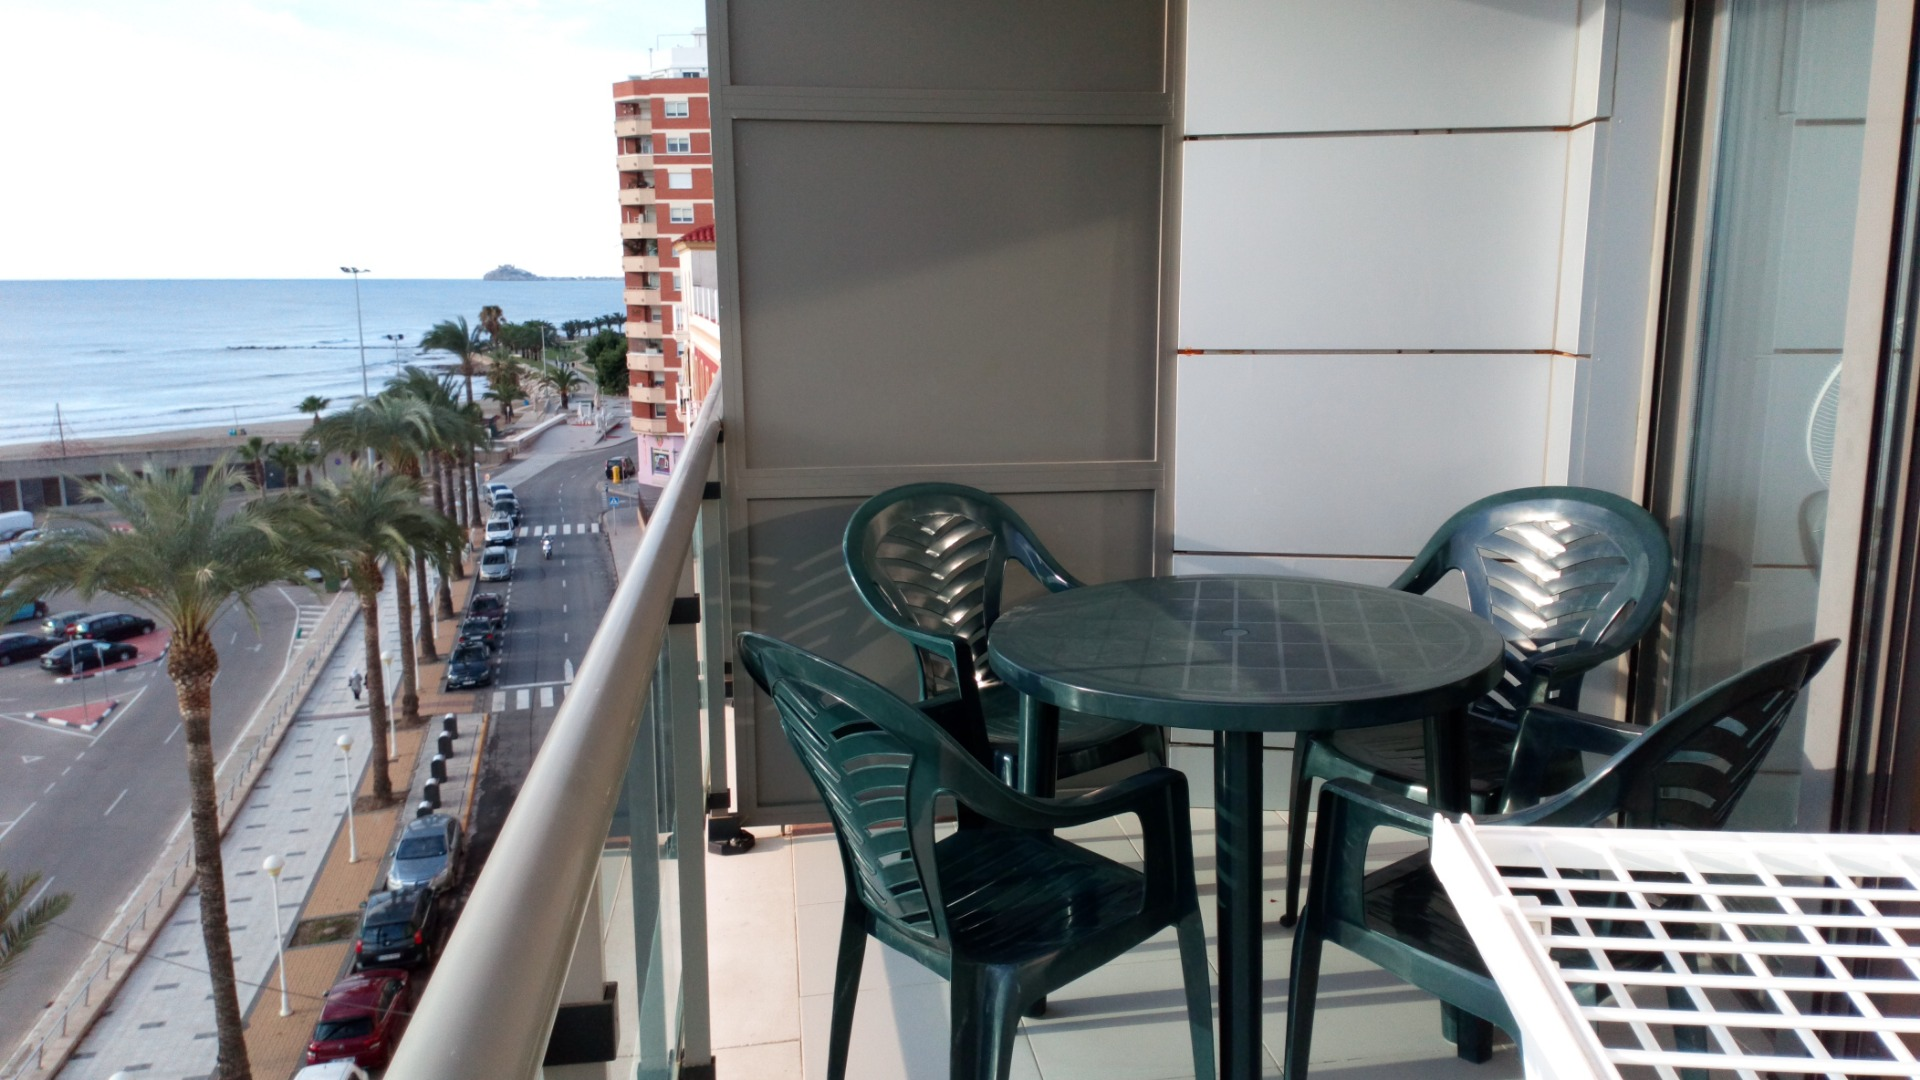 Saisonmiete Etagenwohnung  Avenida marqués de benicarló, 32. Apartamento en alquiler vacacional – 1ª línea de mar - benicarló